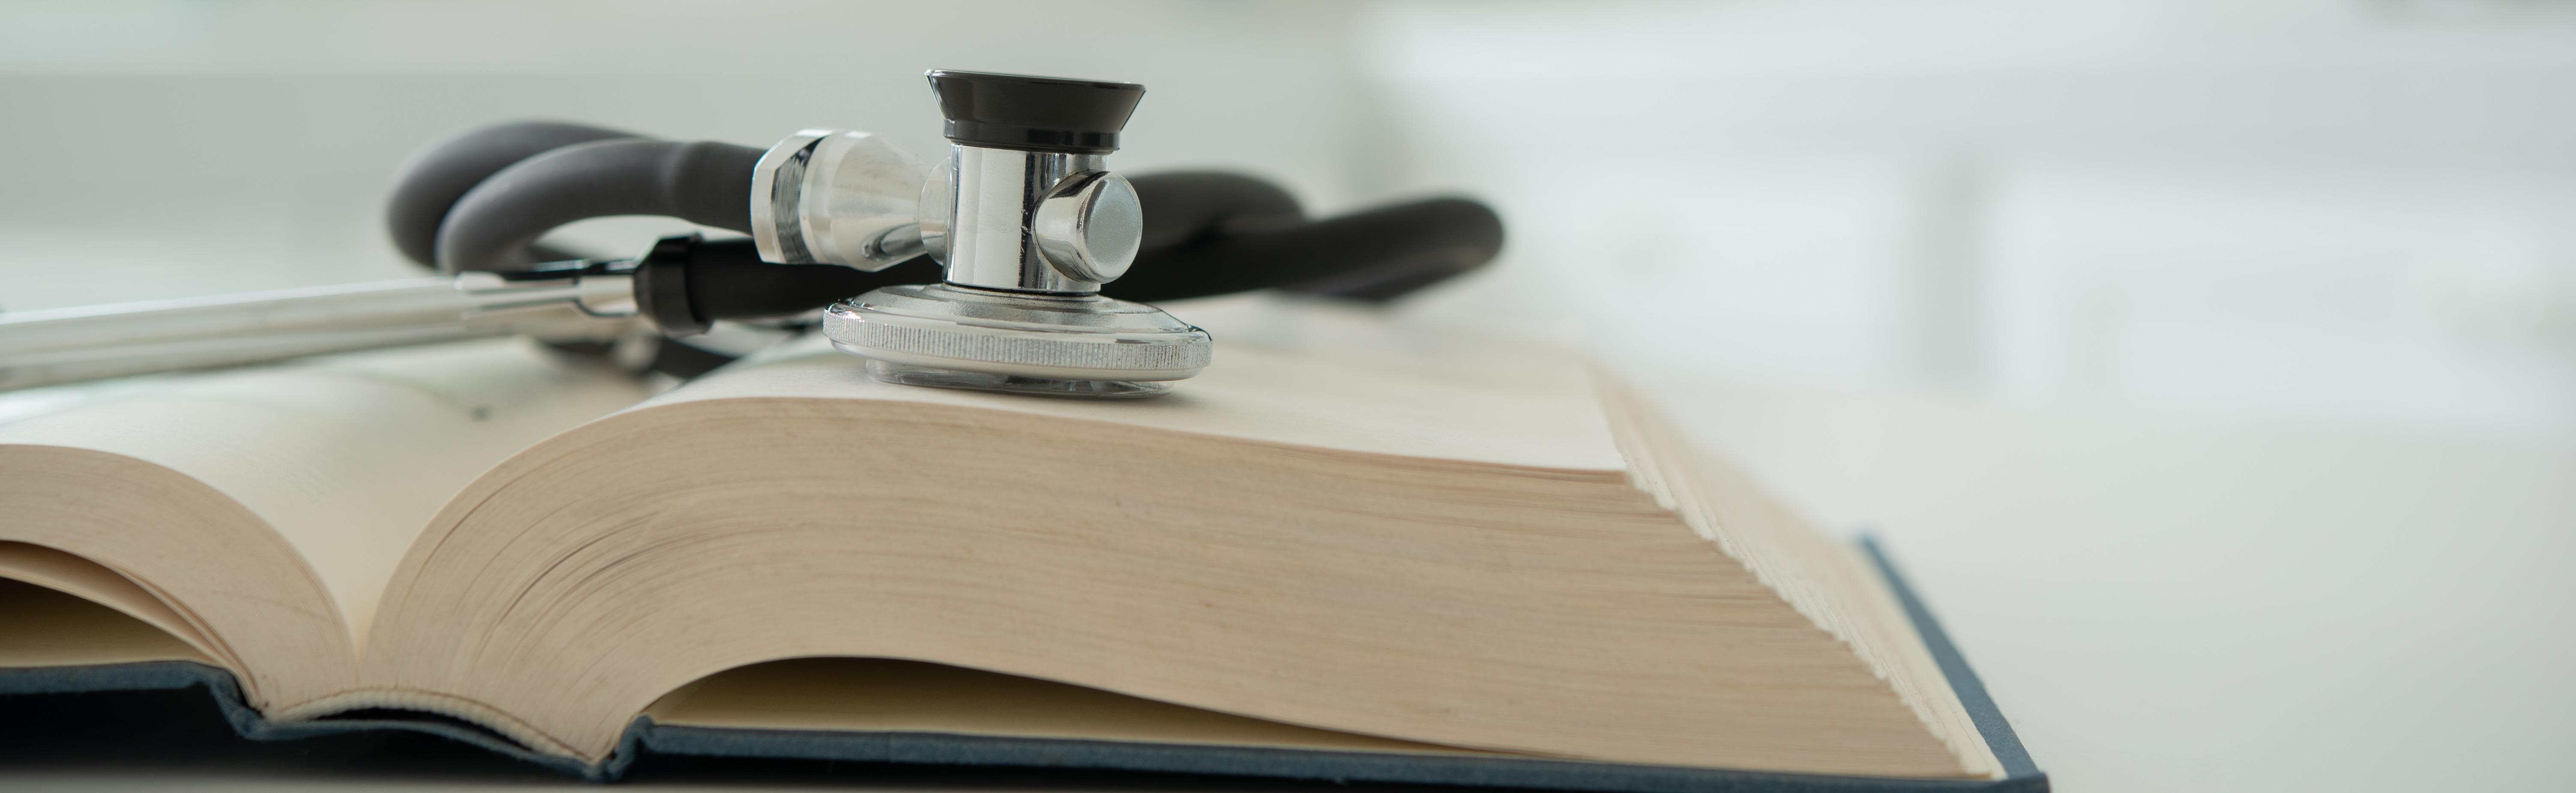 Health Resources